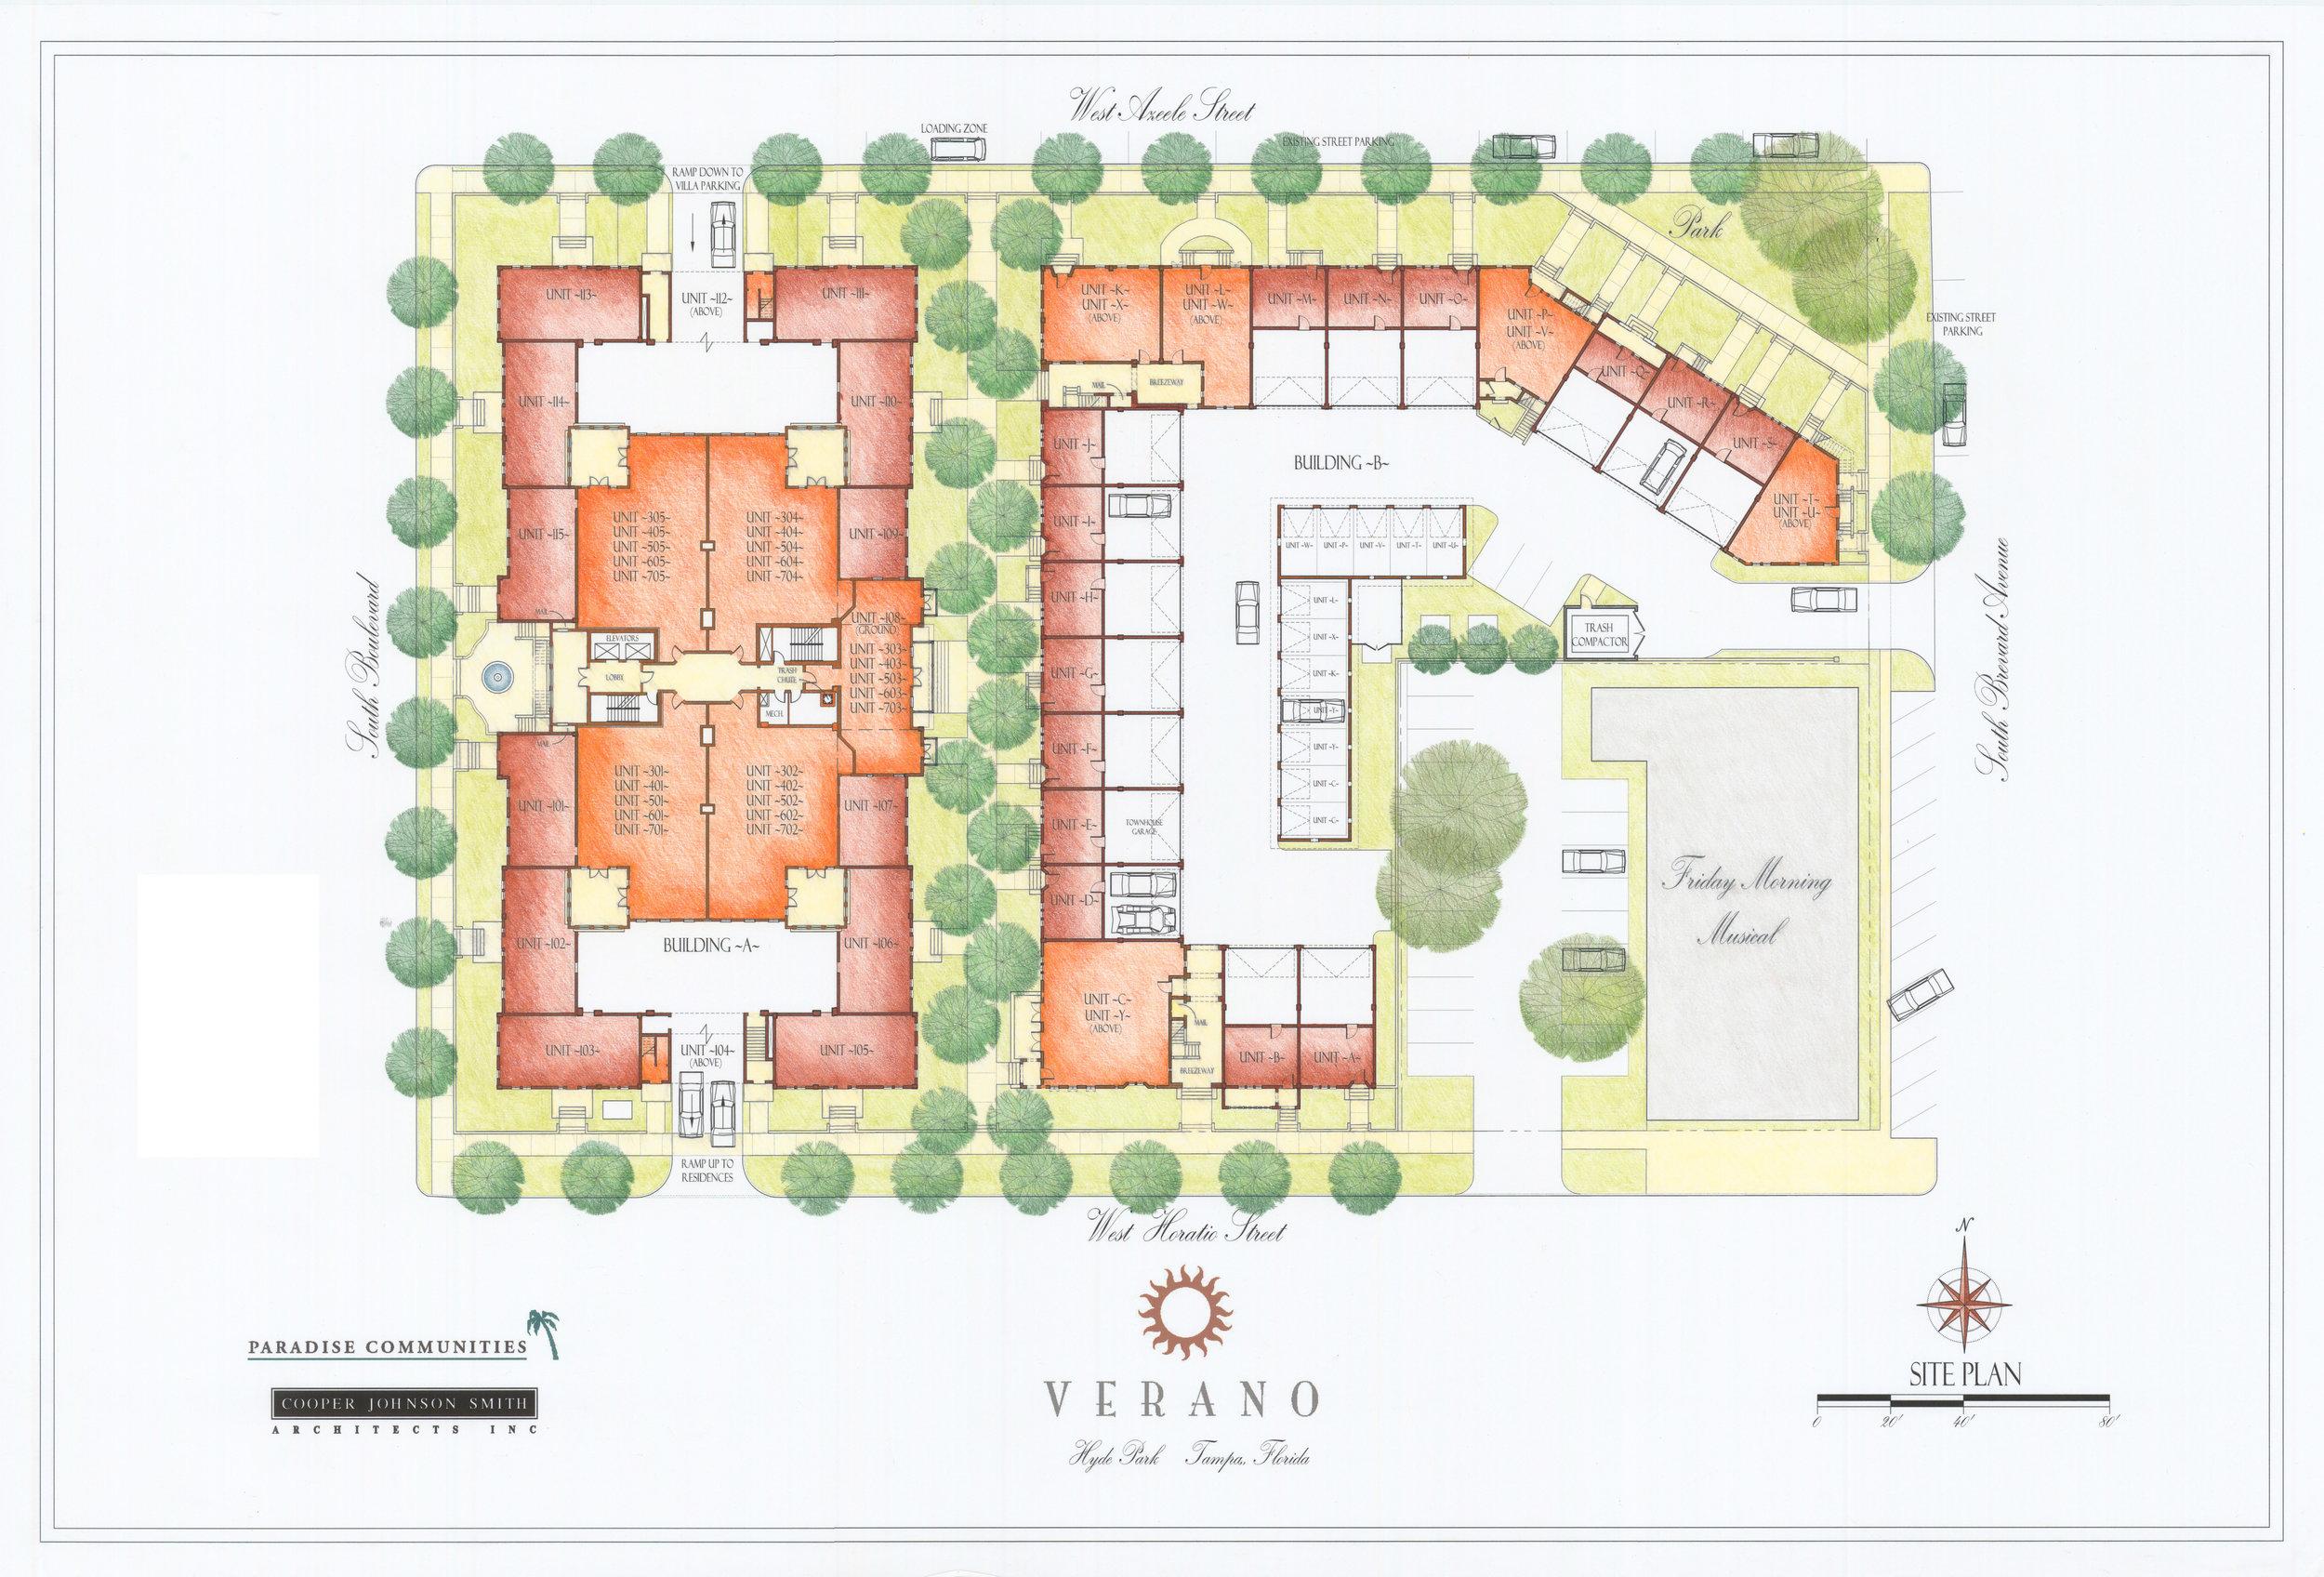 Verano-siteplan2.jpg